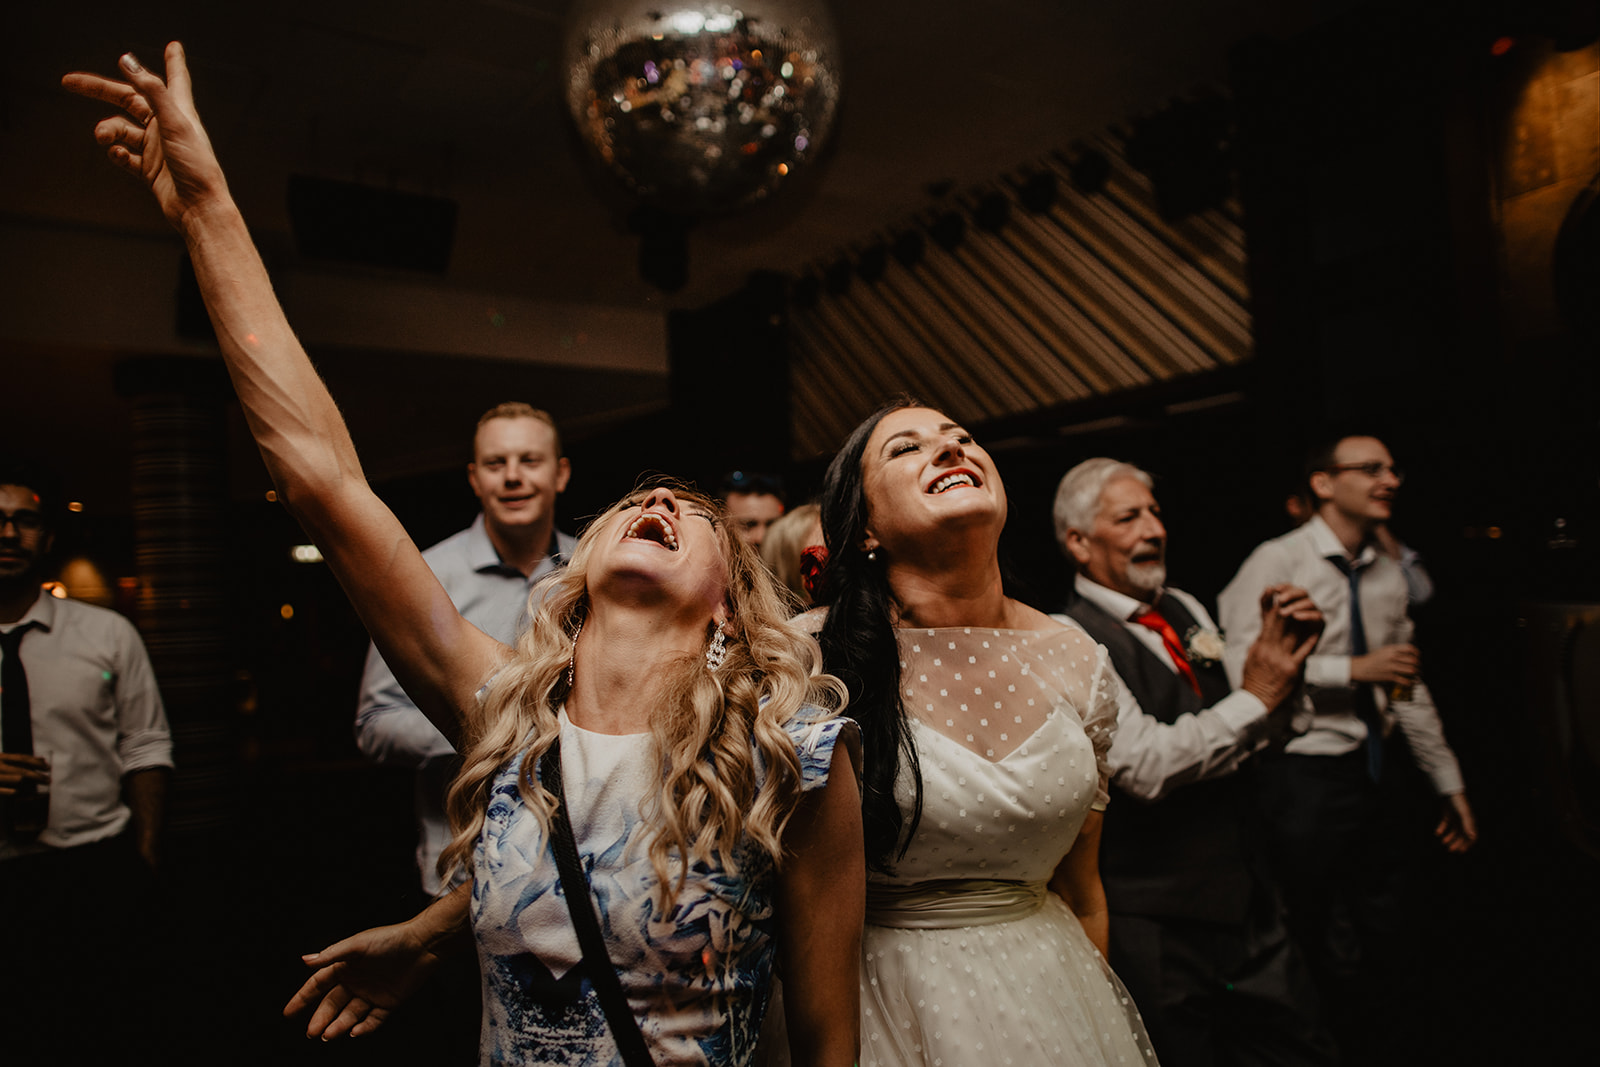 Lapela-photography-wedding-algarve-portugal-best-of-79.jpg